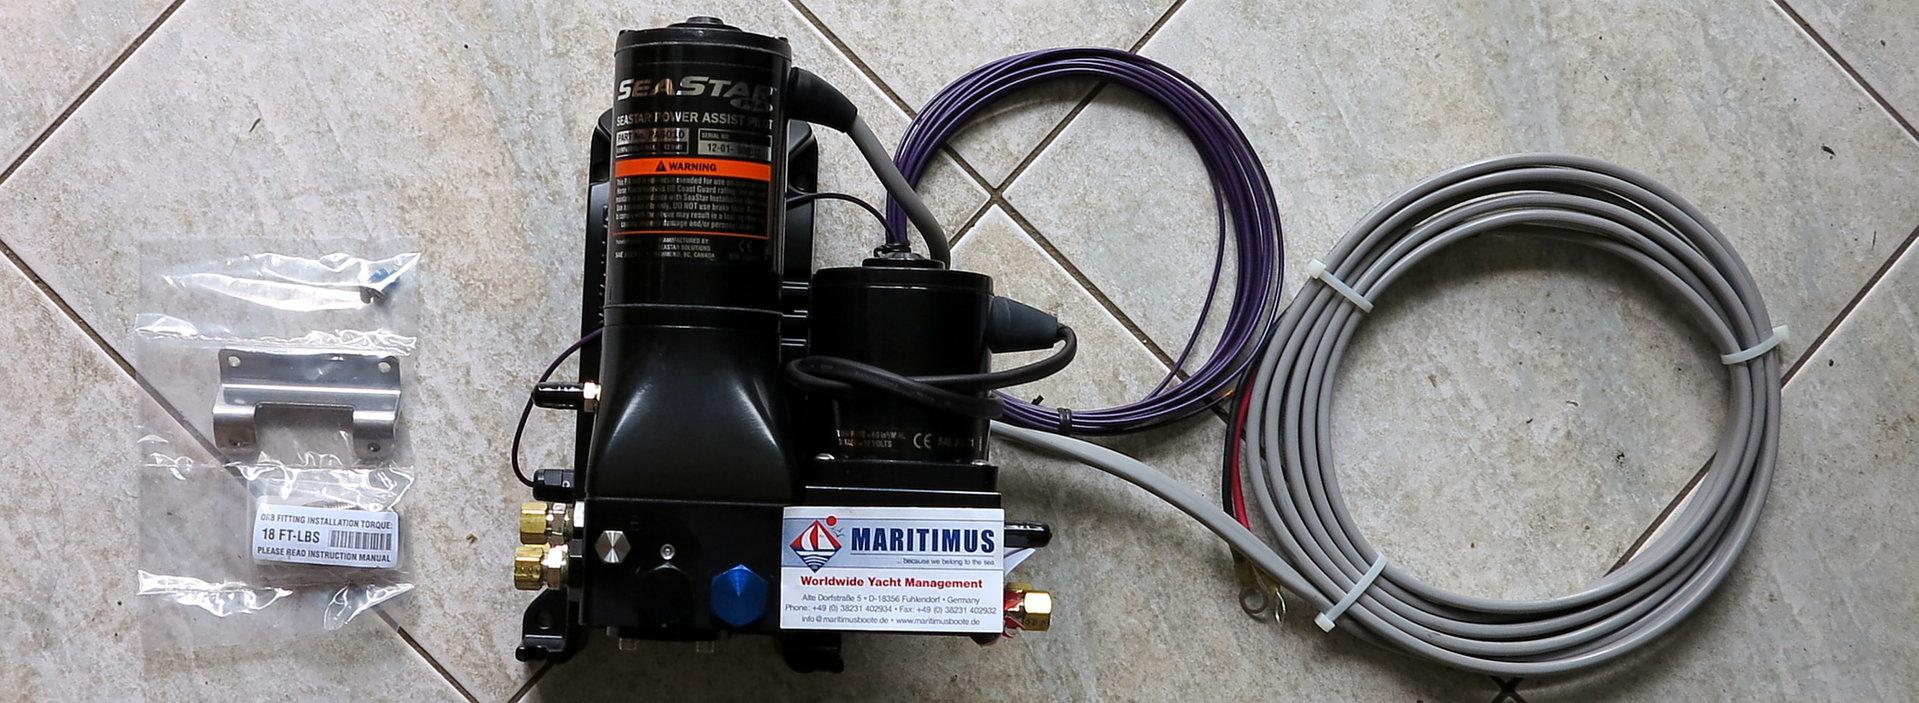 SeaStar Power Assist Autopilot, PA6010 / PA6020, 12 or 24V